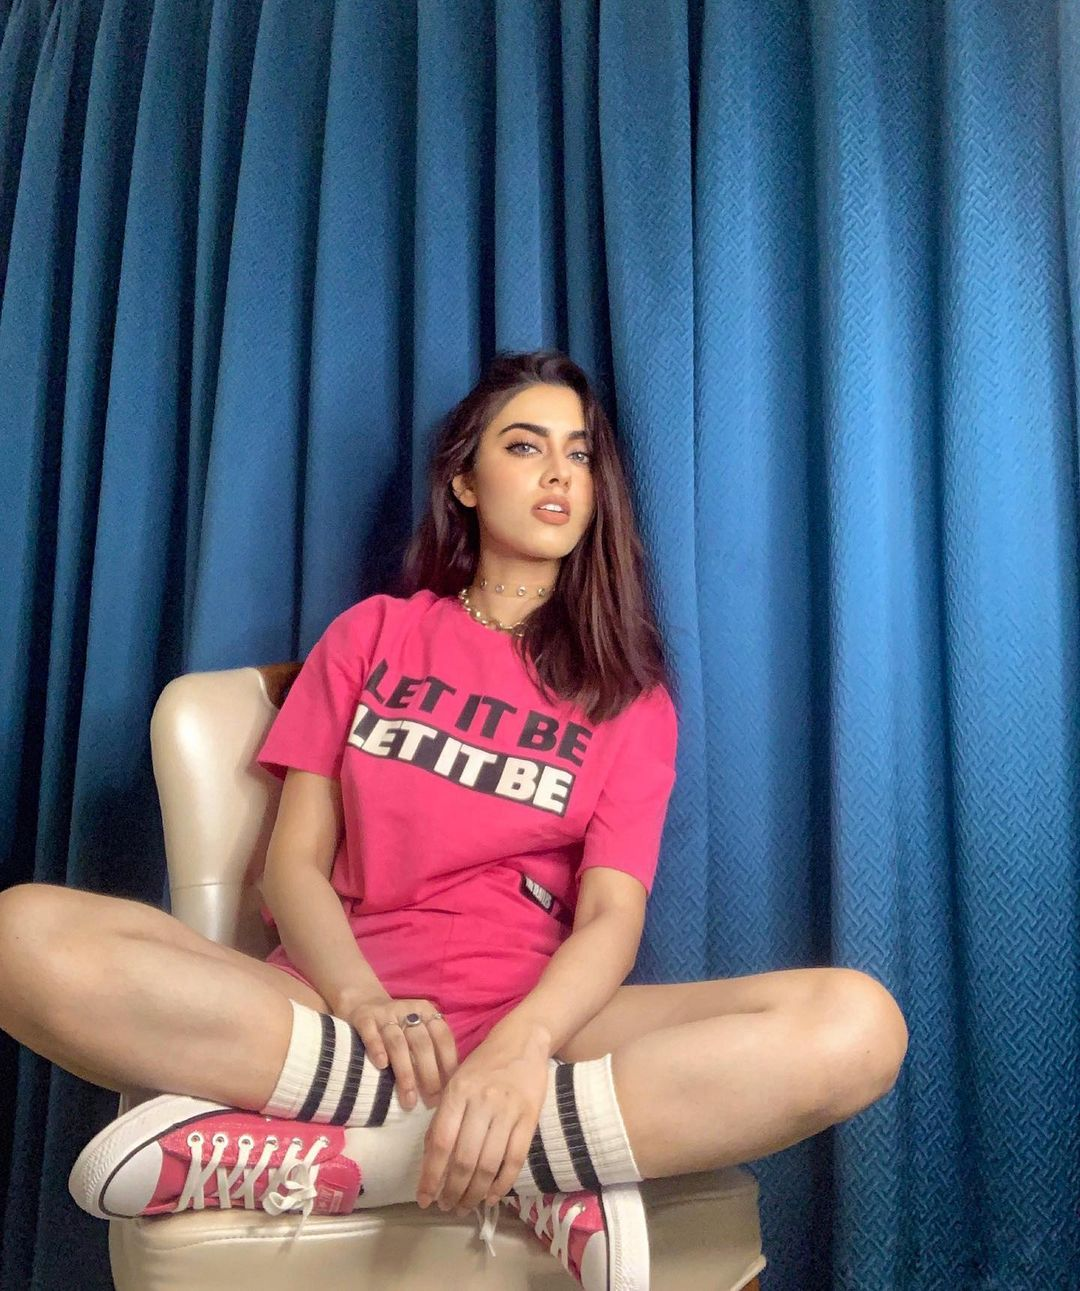 Potret Seksi Sakshma Srivastav, Artis India yang Bikin BTS Salting!